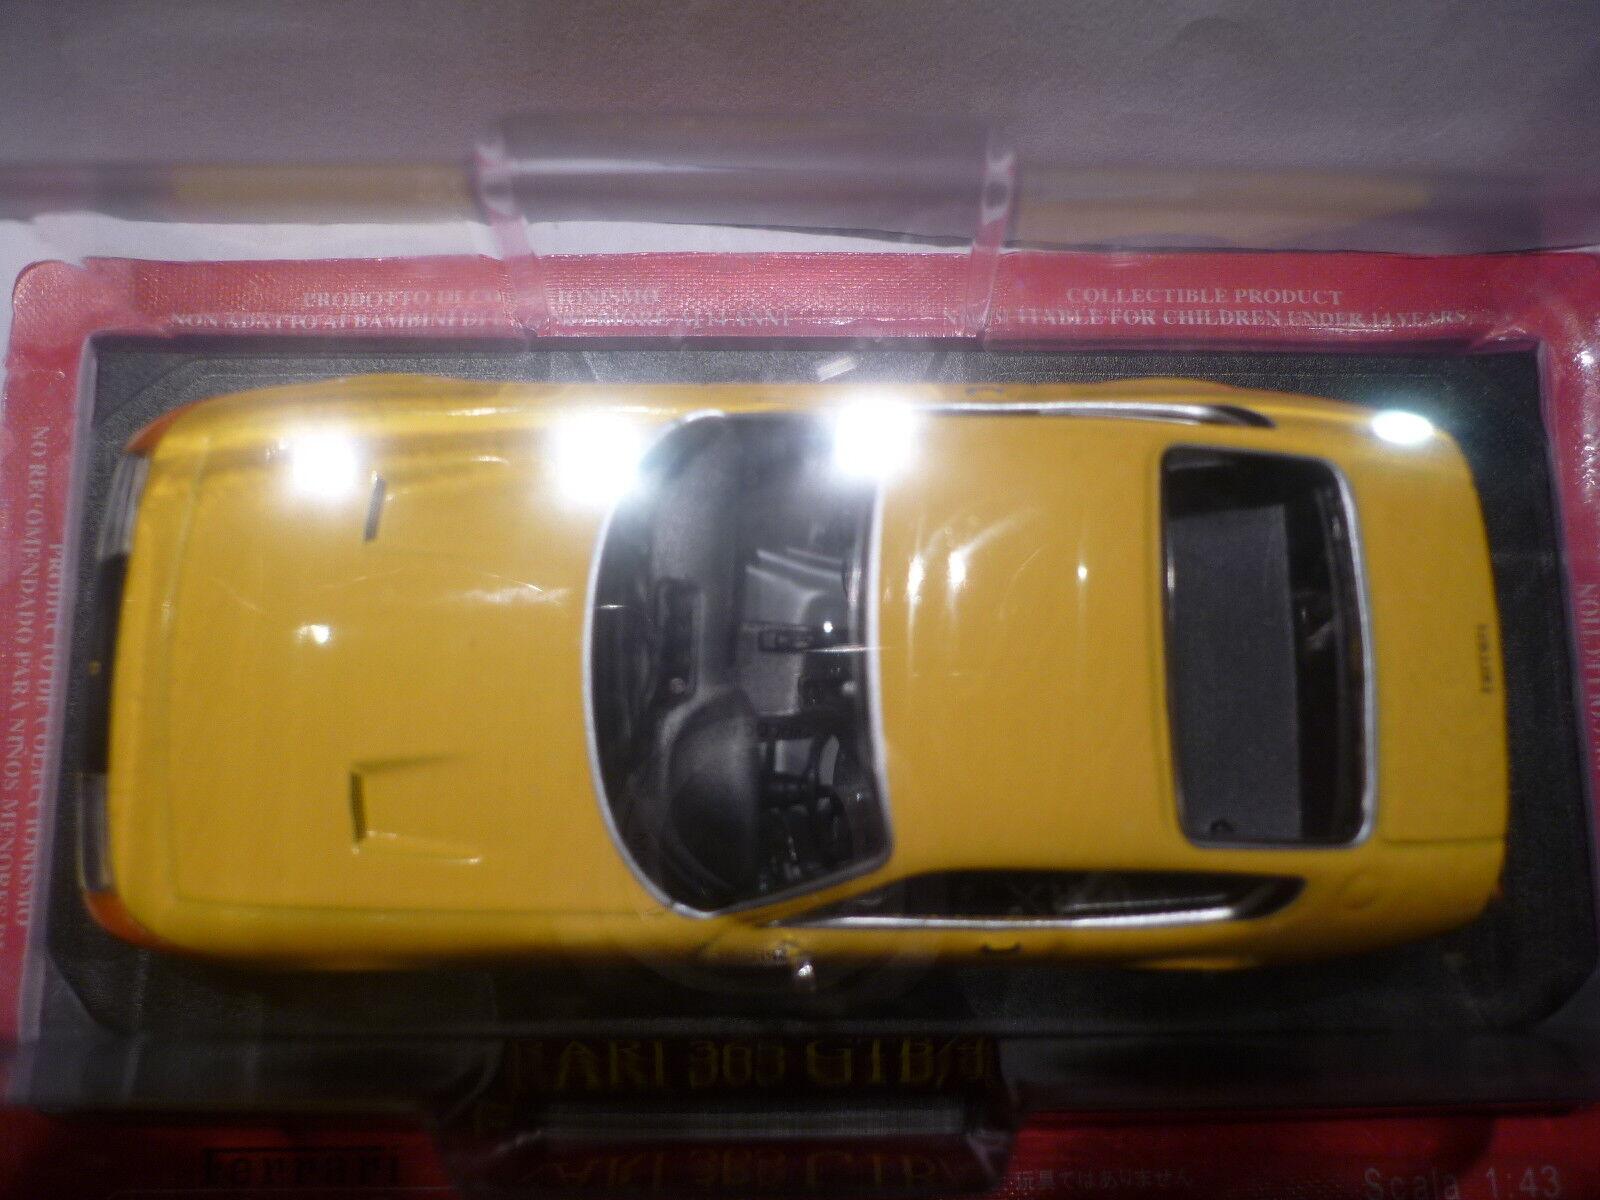 FERRARI 365 GTB/4 daytona jaune ou sous 365 GTC/4 rouge 1:43 neuves sous ou blister c71eee